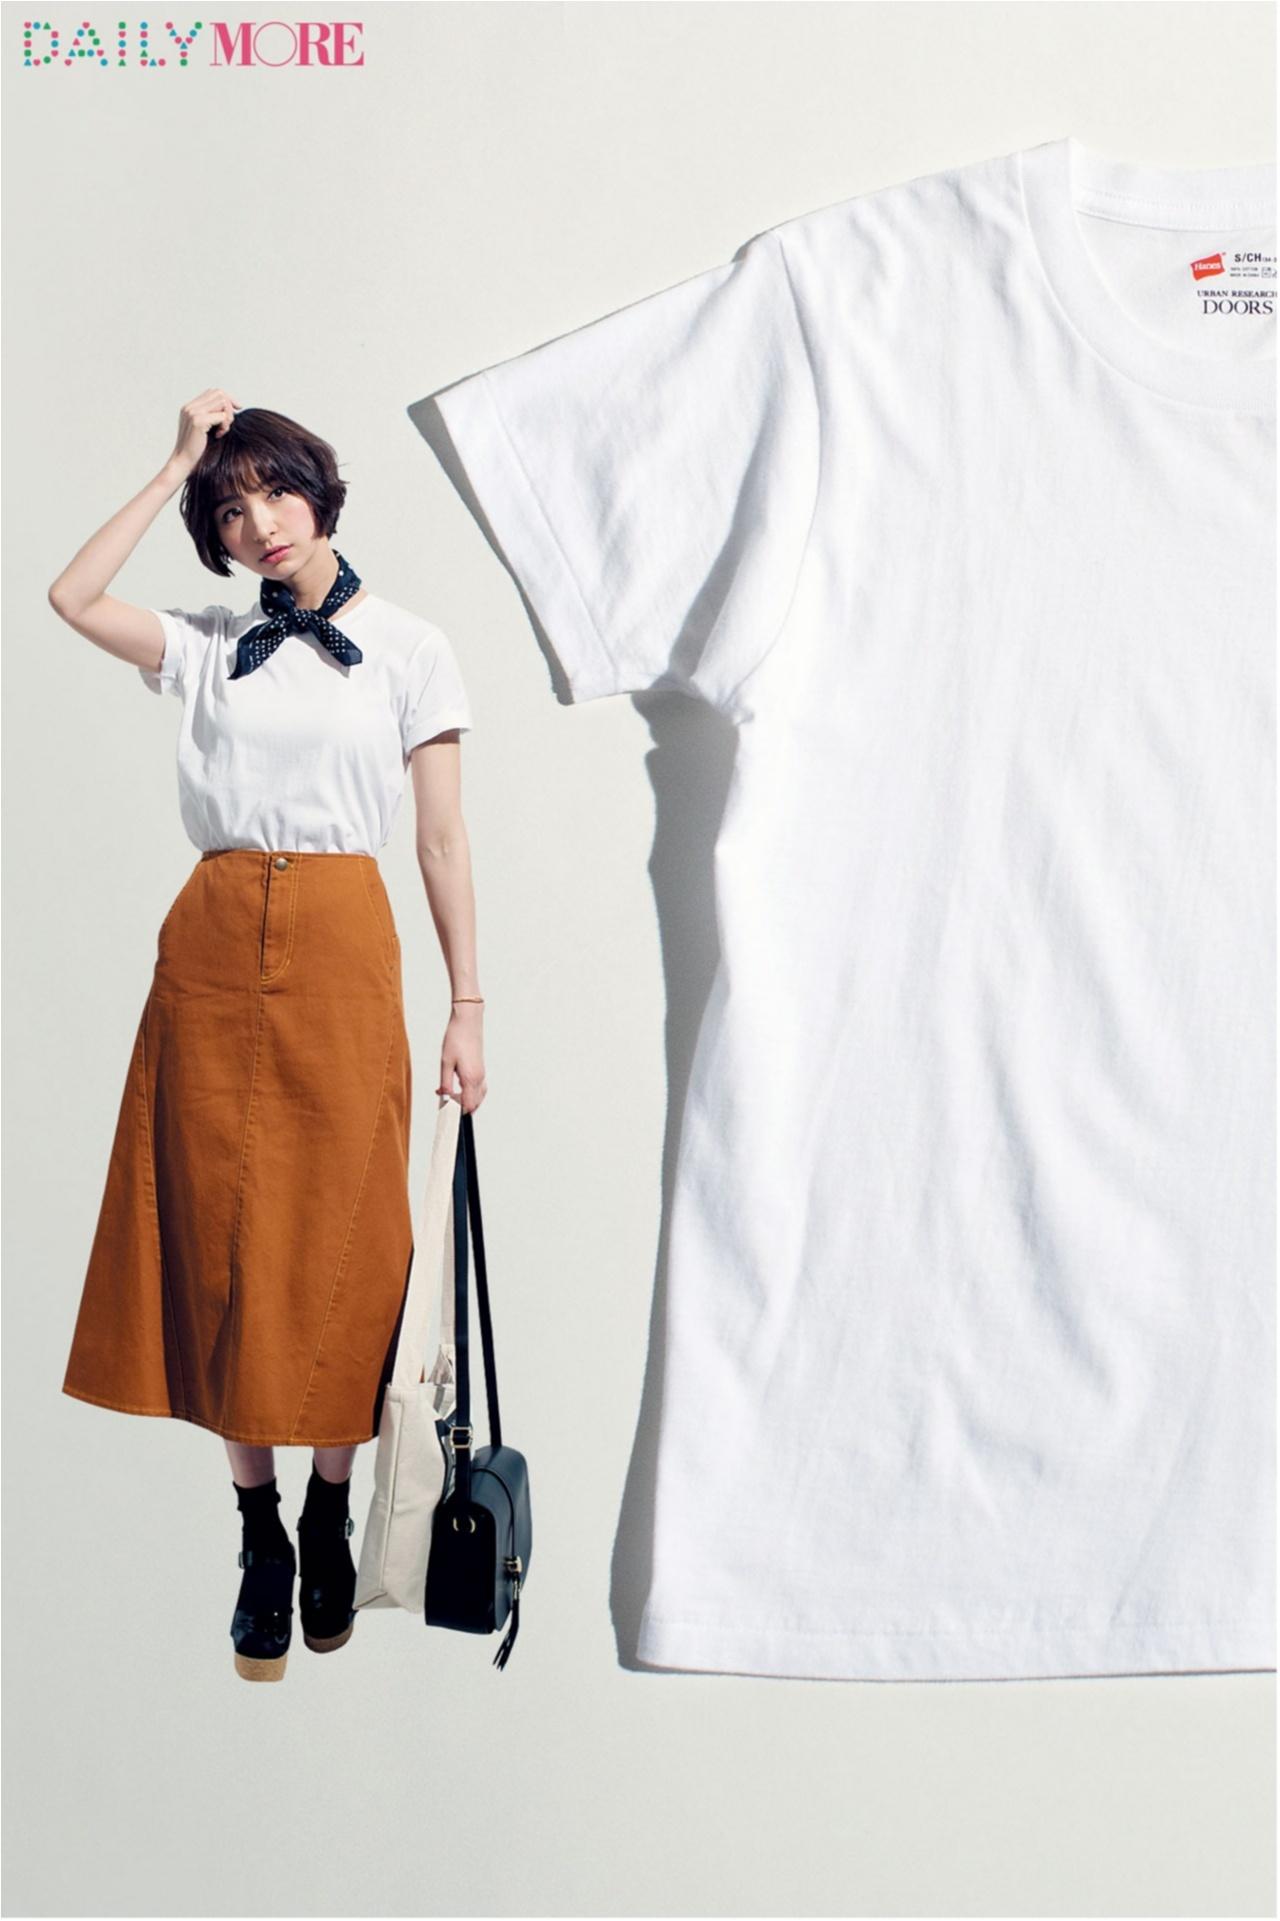 Tシャツ&ワイドパンツ……注目のアイテム記事が大人気♡ 今週の人気ランキングトップ3!_3